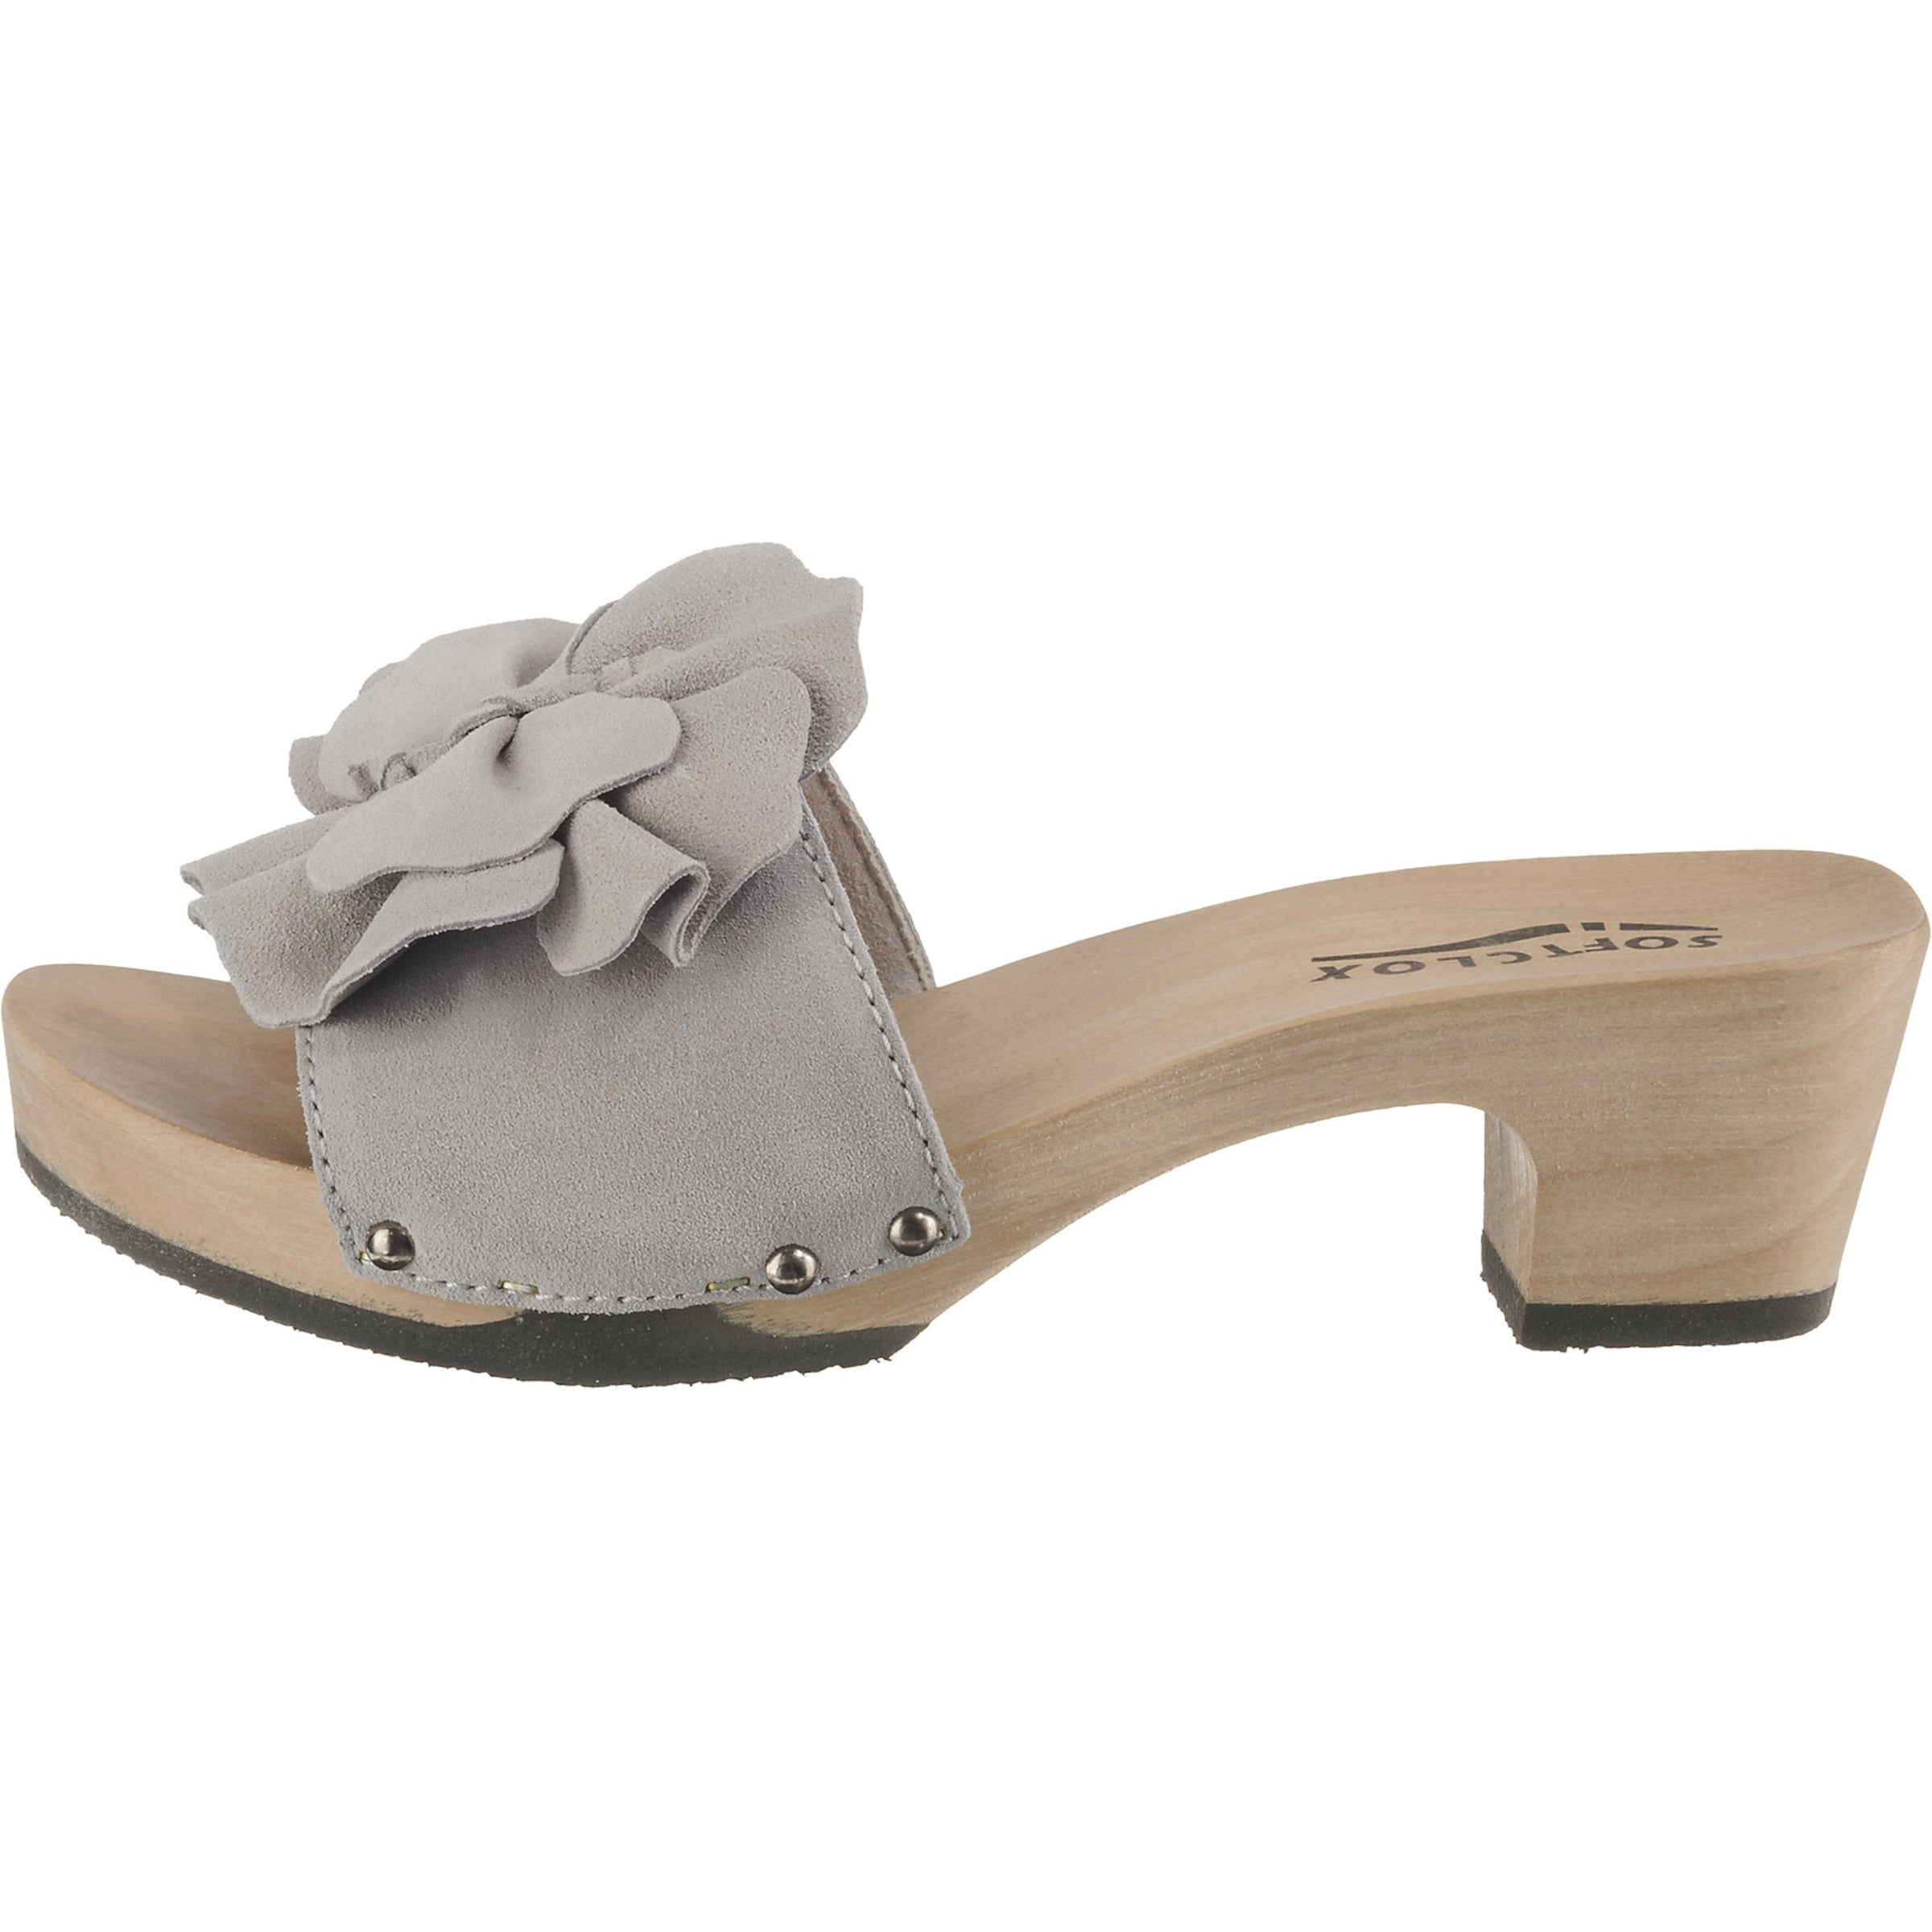 Softclox 'kassandra' Softclox Pantolette In Grau Yfg76byv